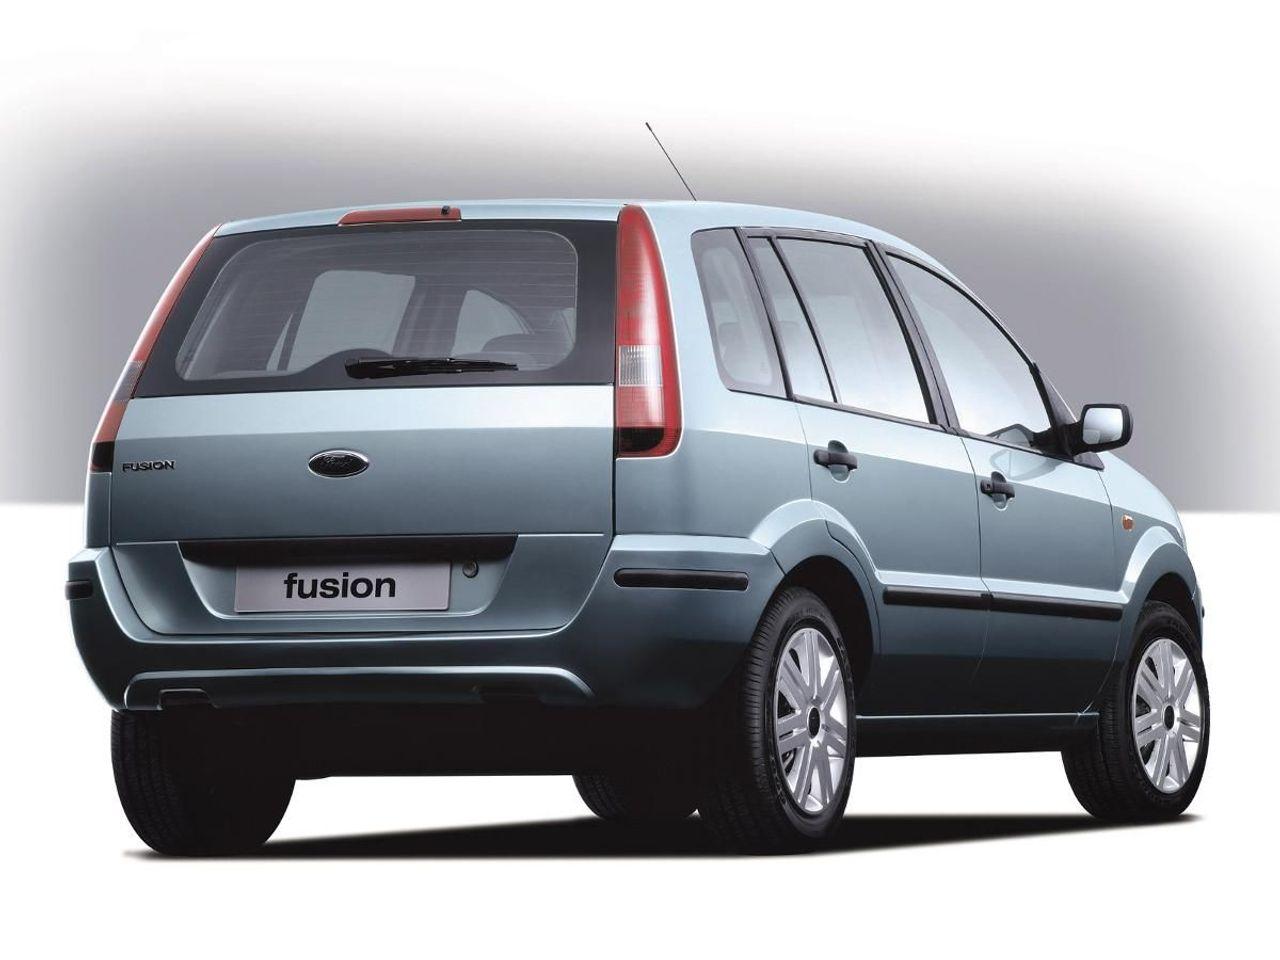 Ford Fusion hatchback